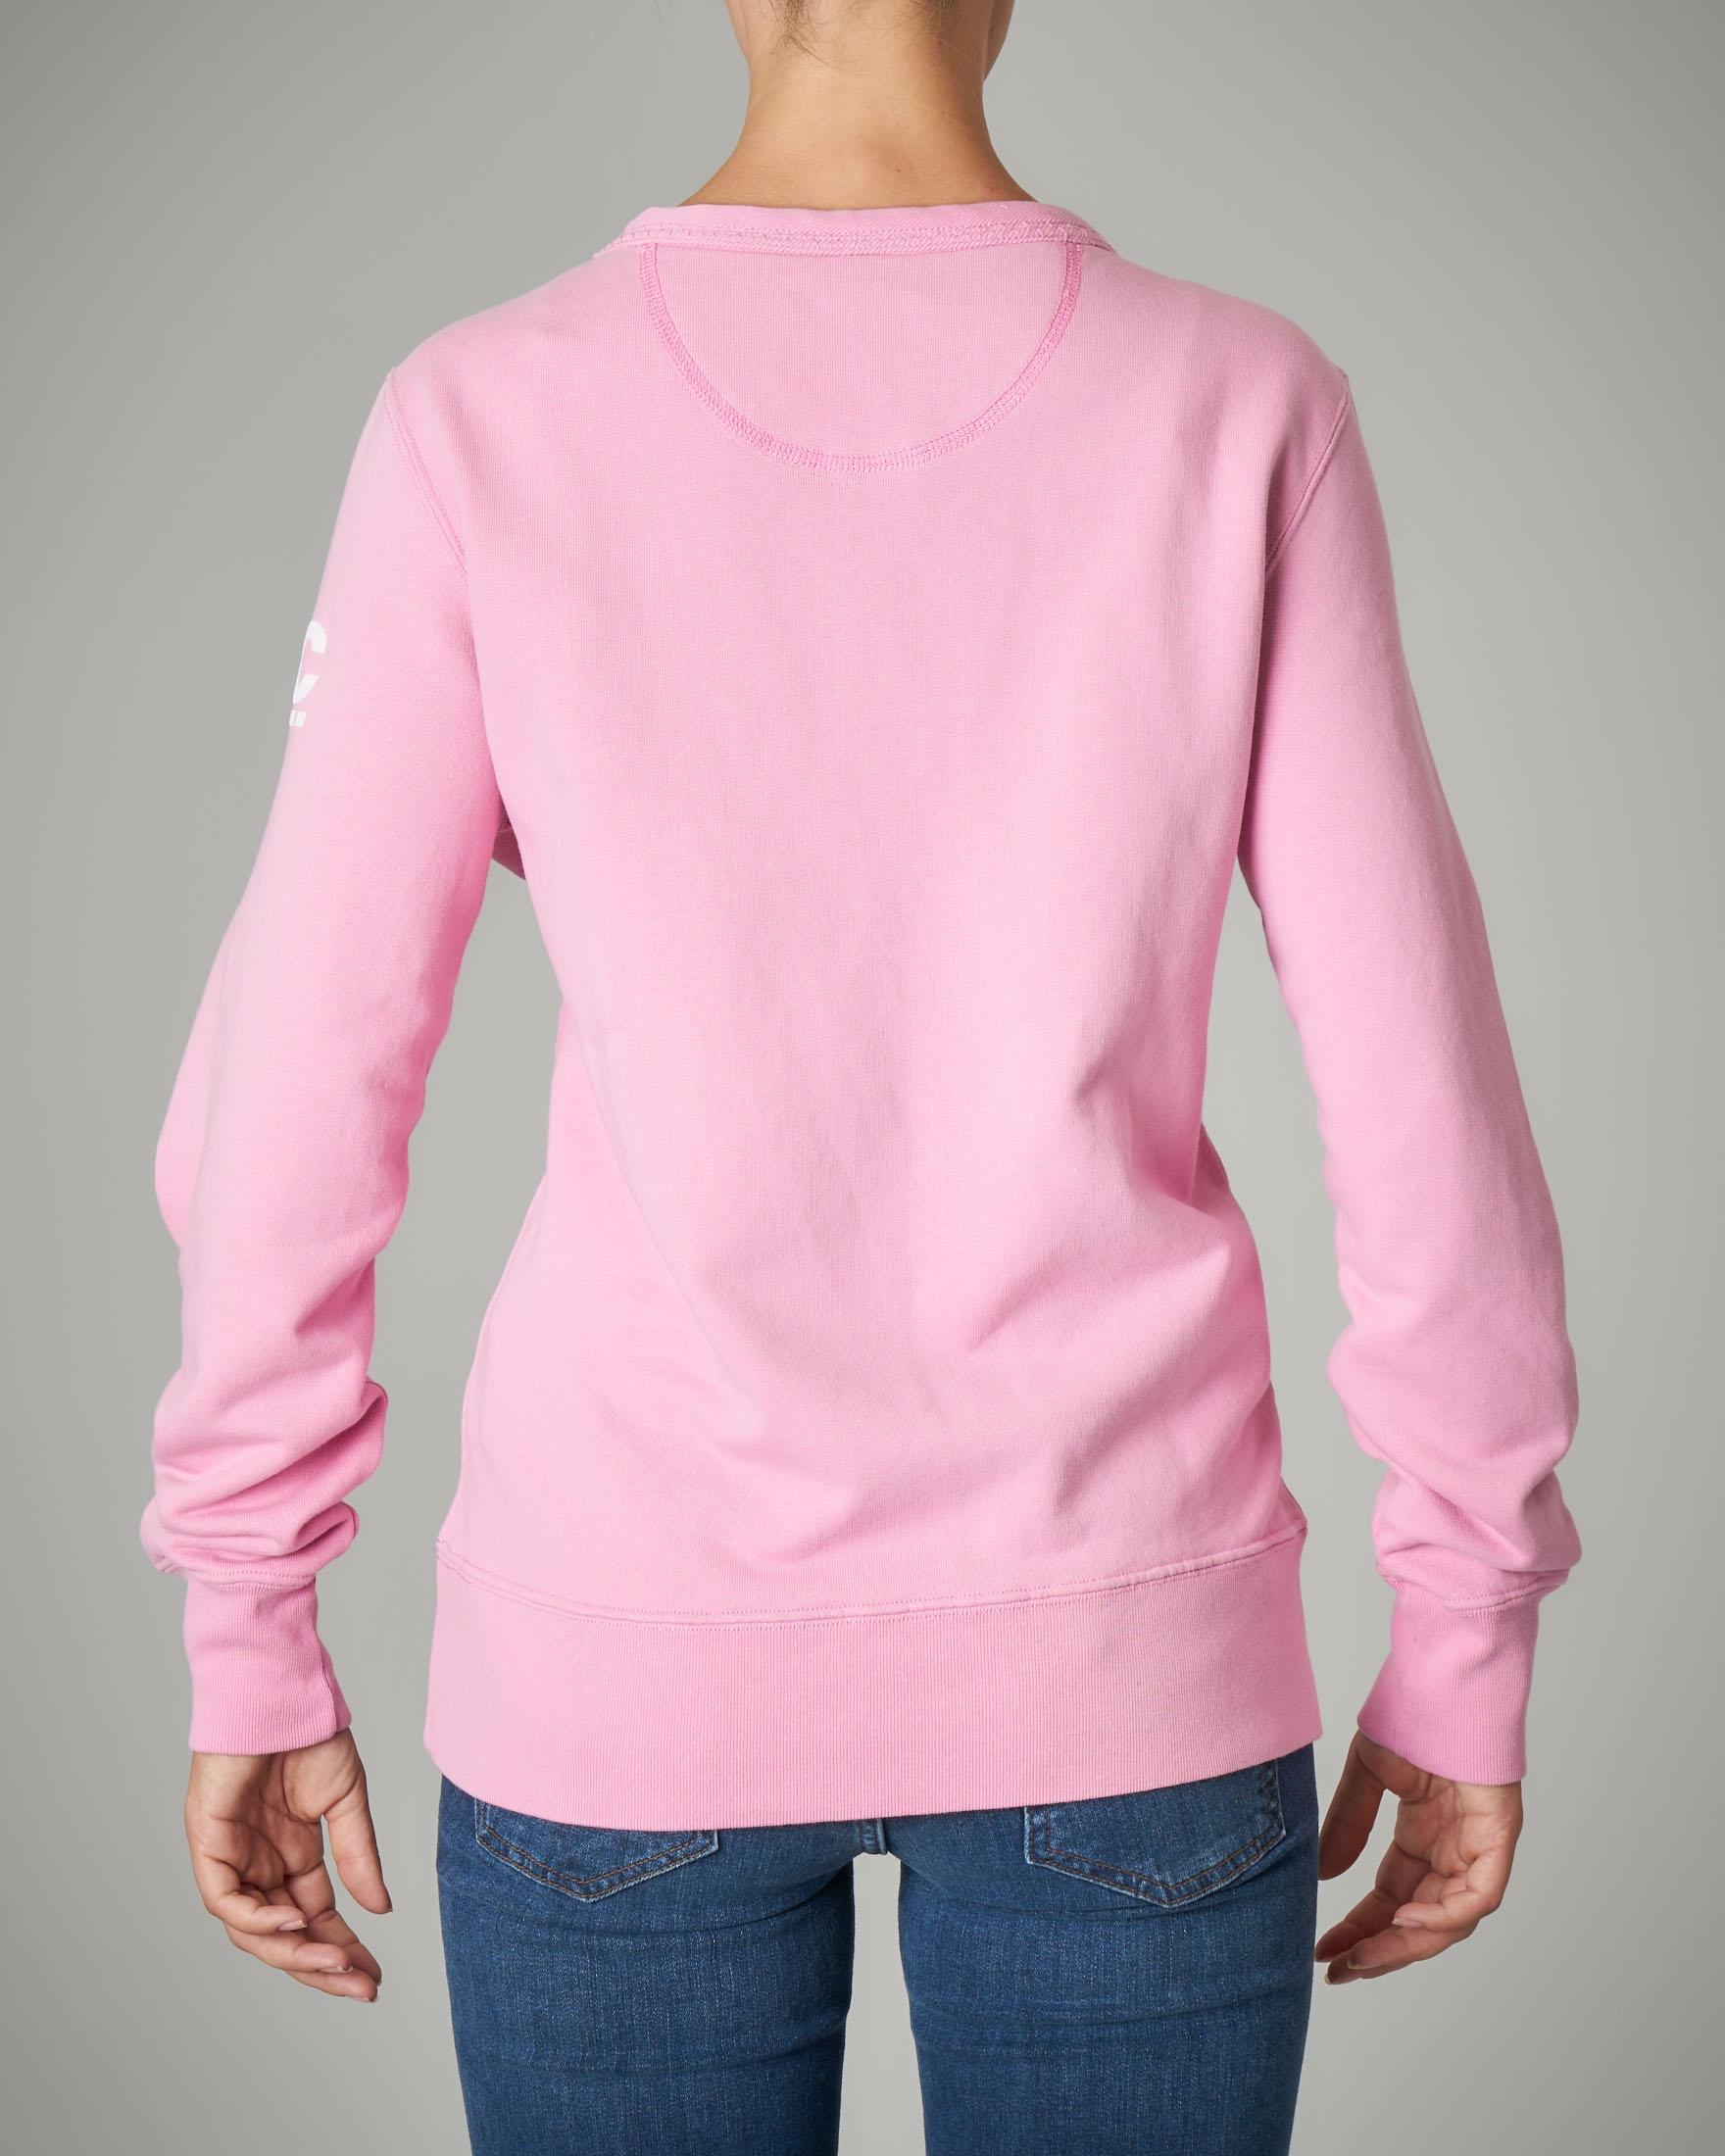 Felpa girocollo rosa in cotone